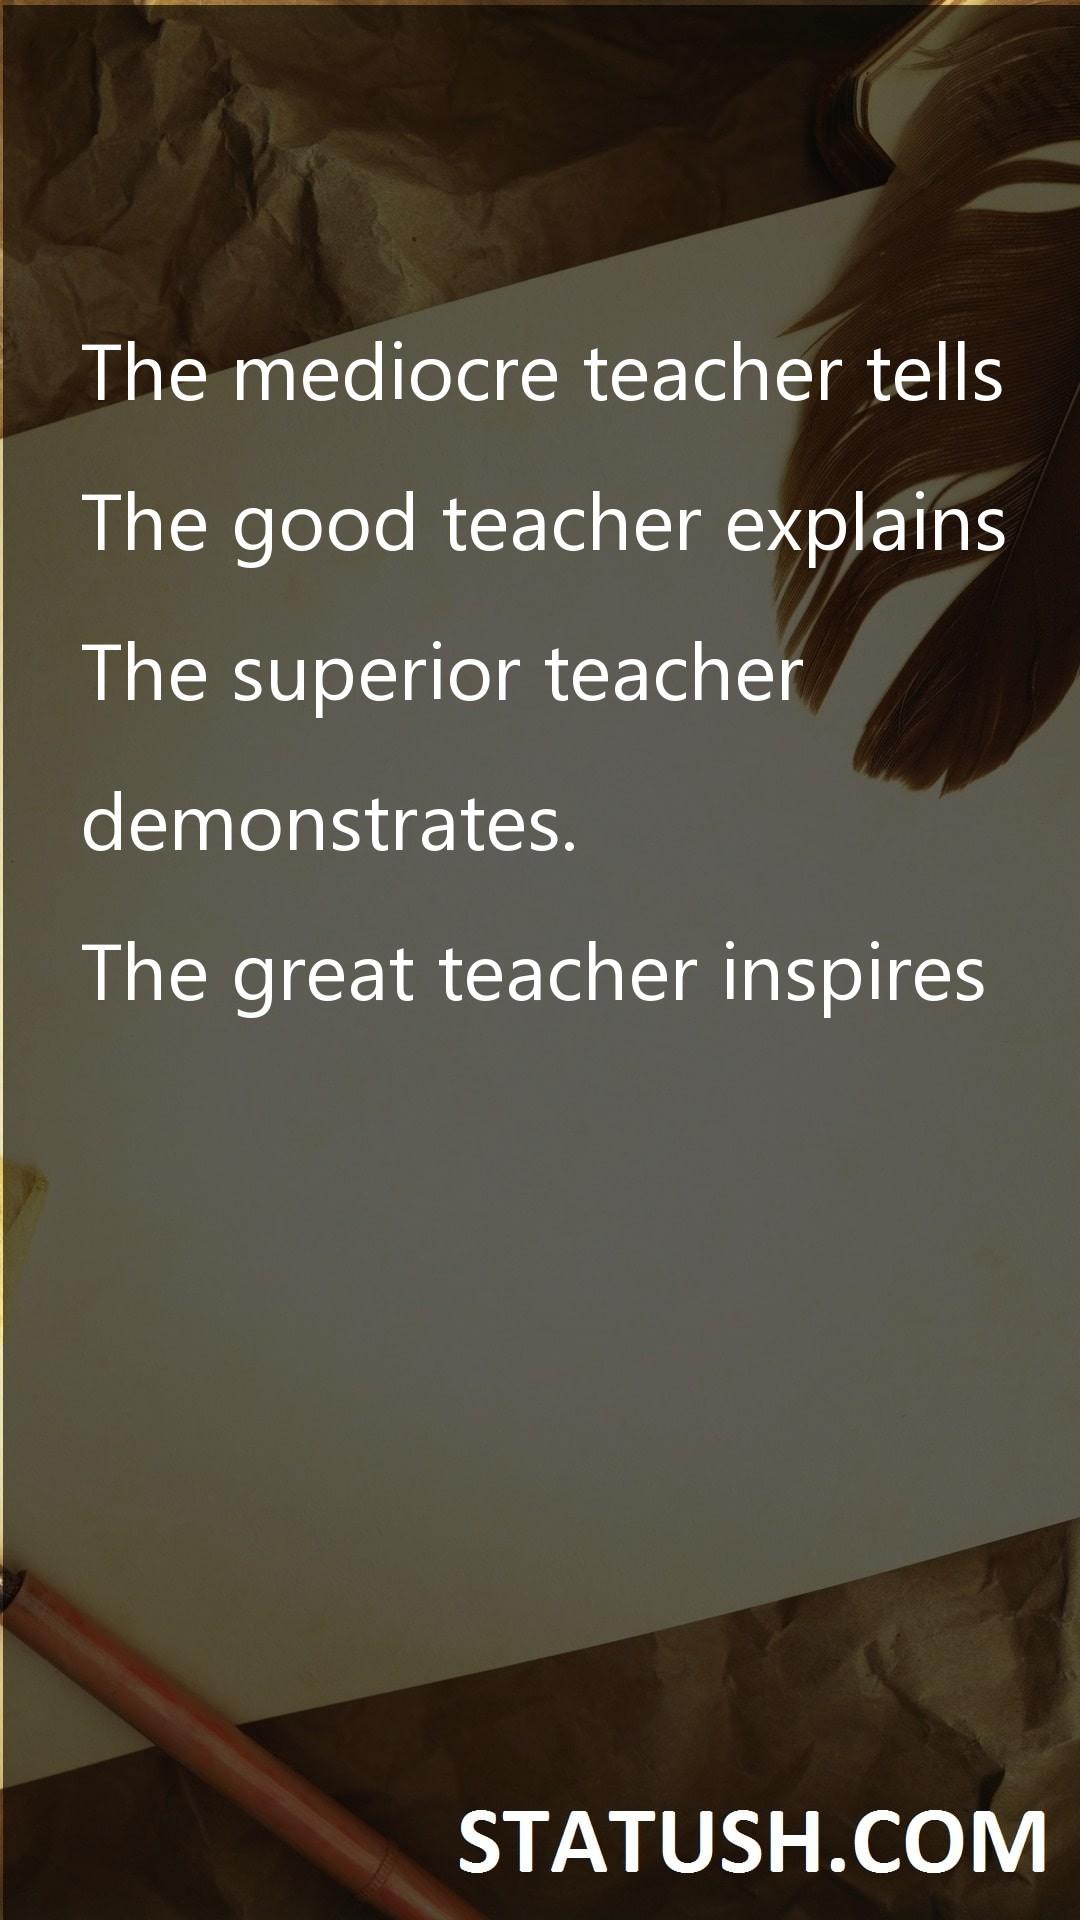 The mediocre teacher tells